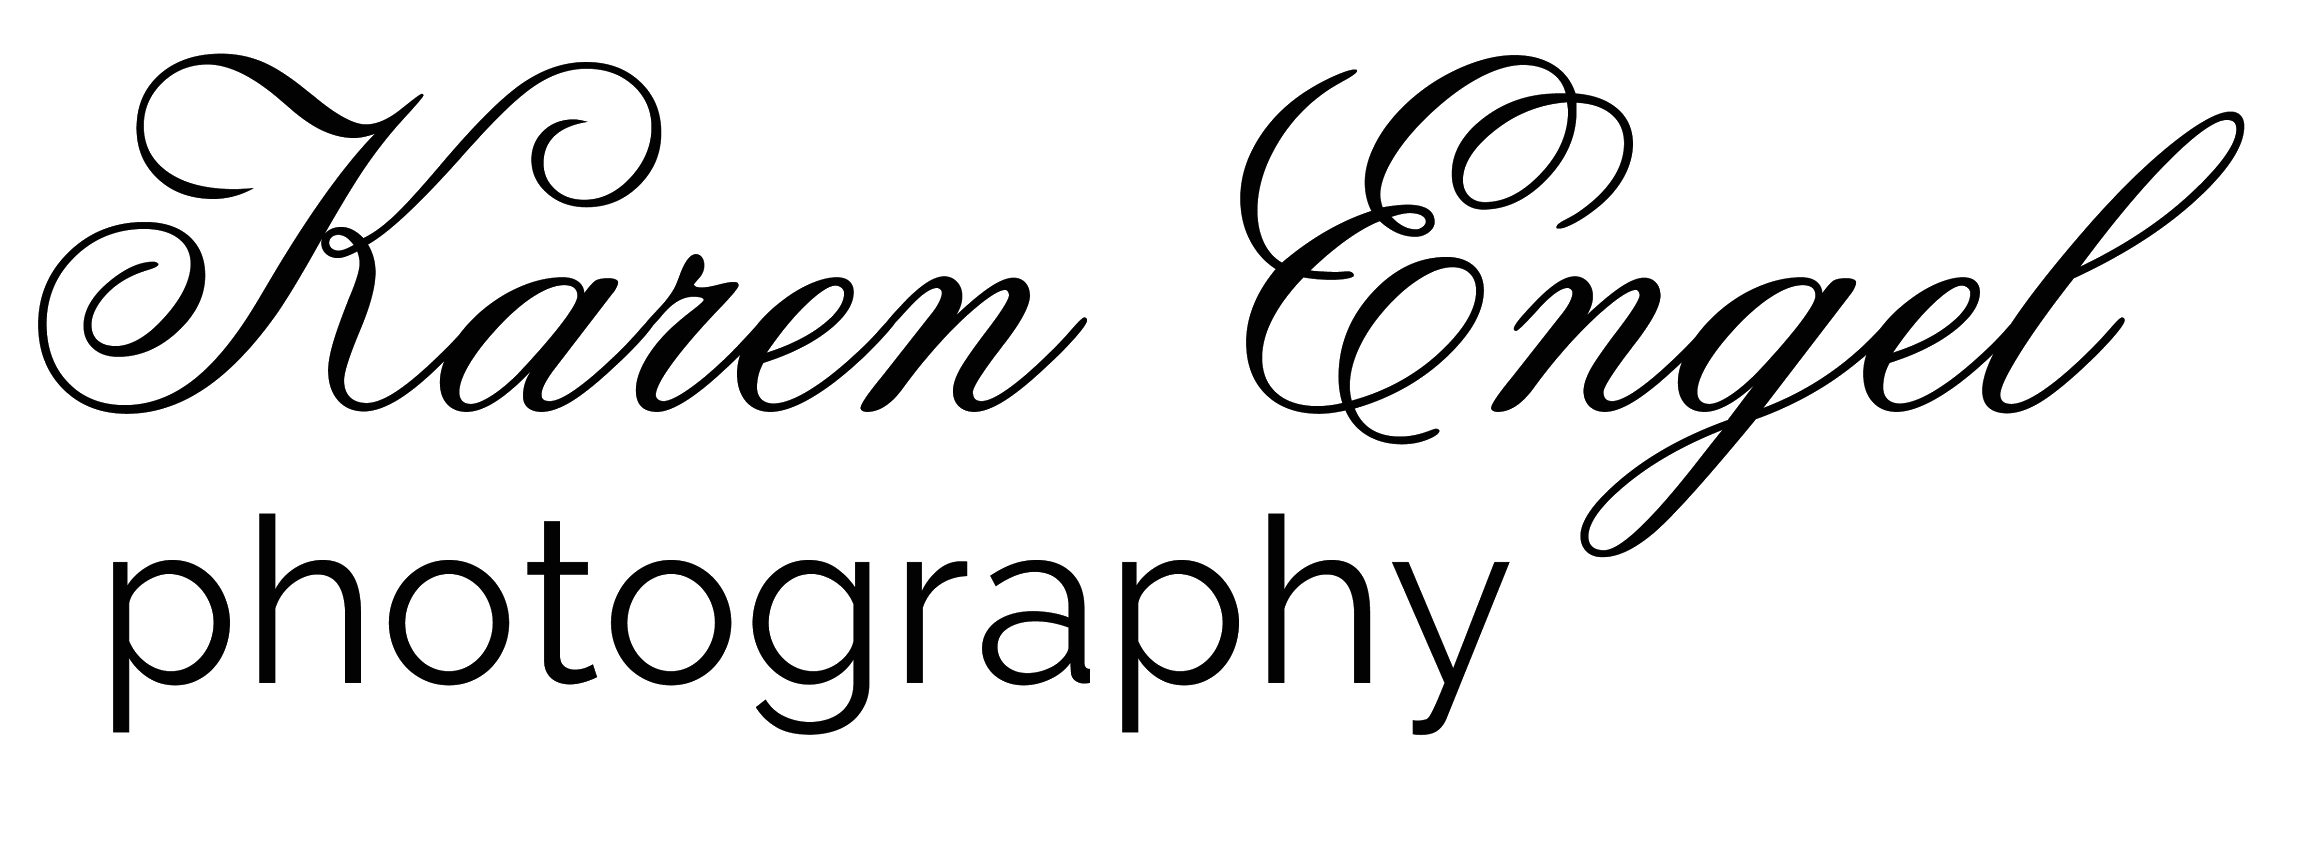 Karen Engel Photography - Headshots  Portrait  Family Business Editorial